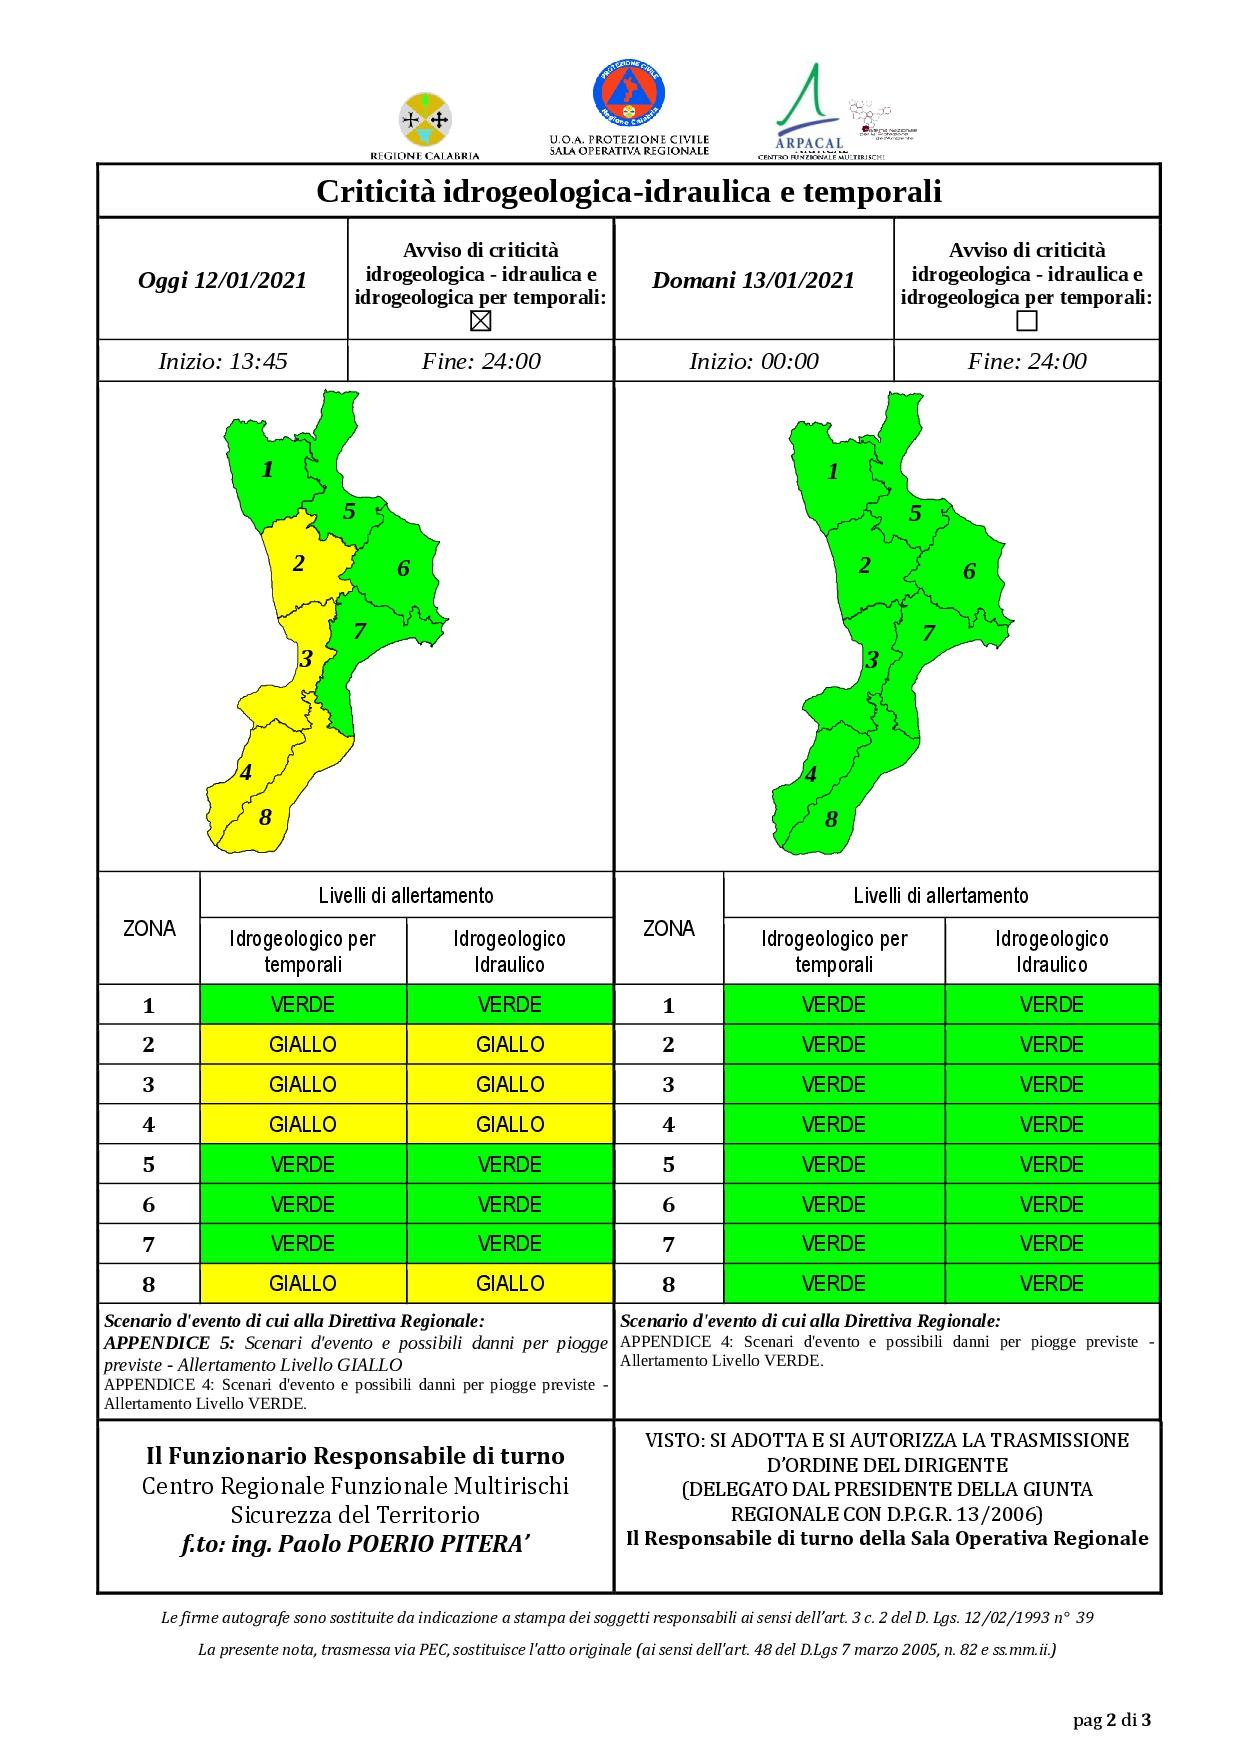 Criticità idrogeologica-idraulica e temporali in Calabria 12-01-2021